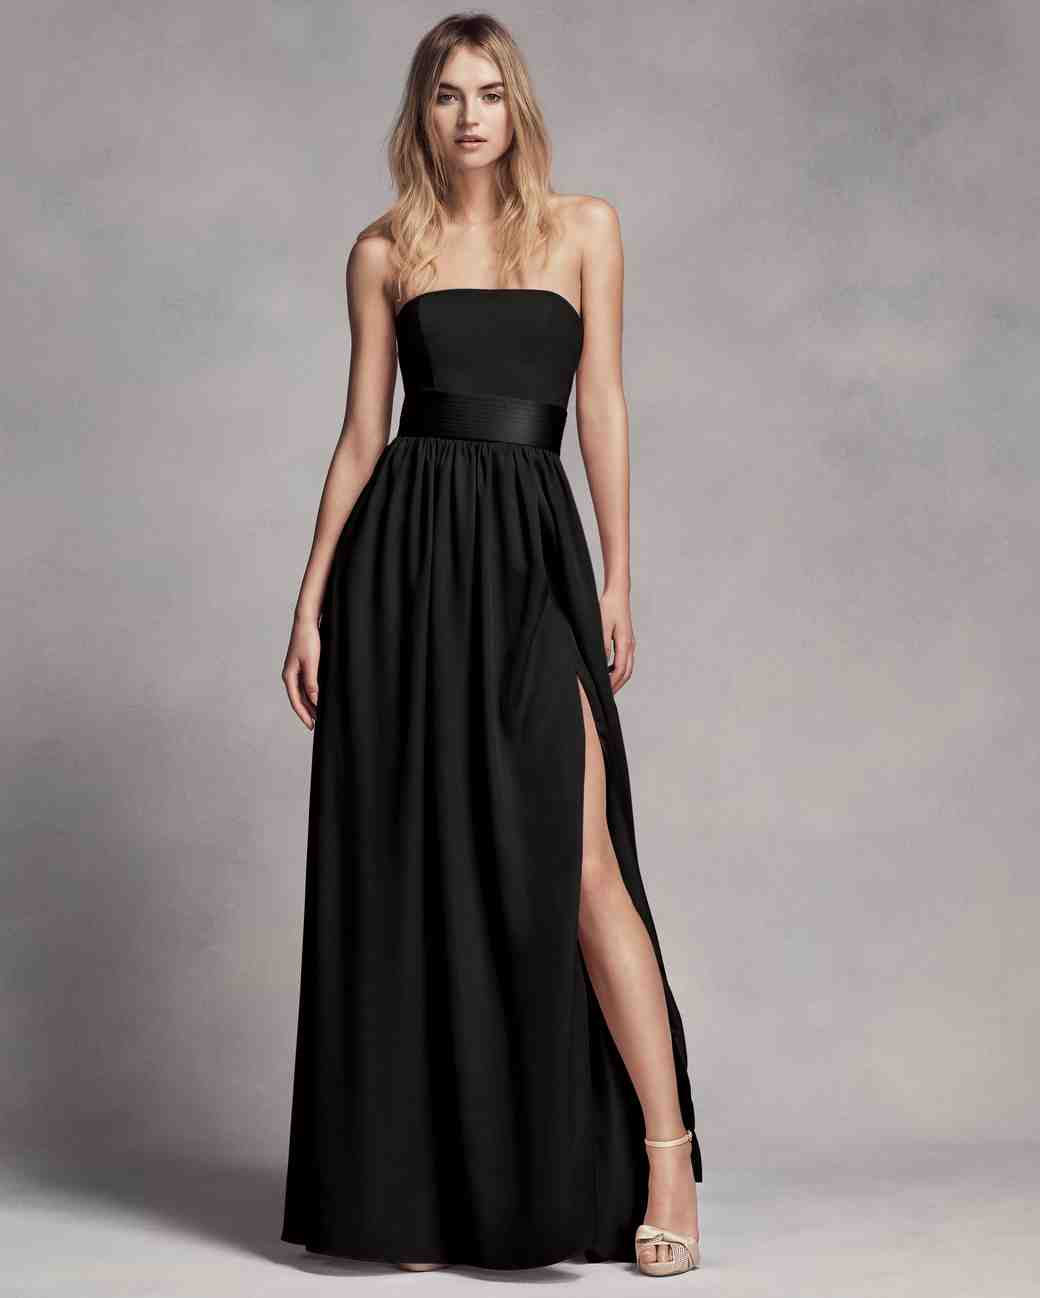 Images of black bridesmaid dresses